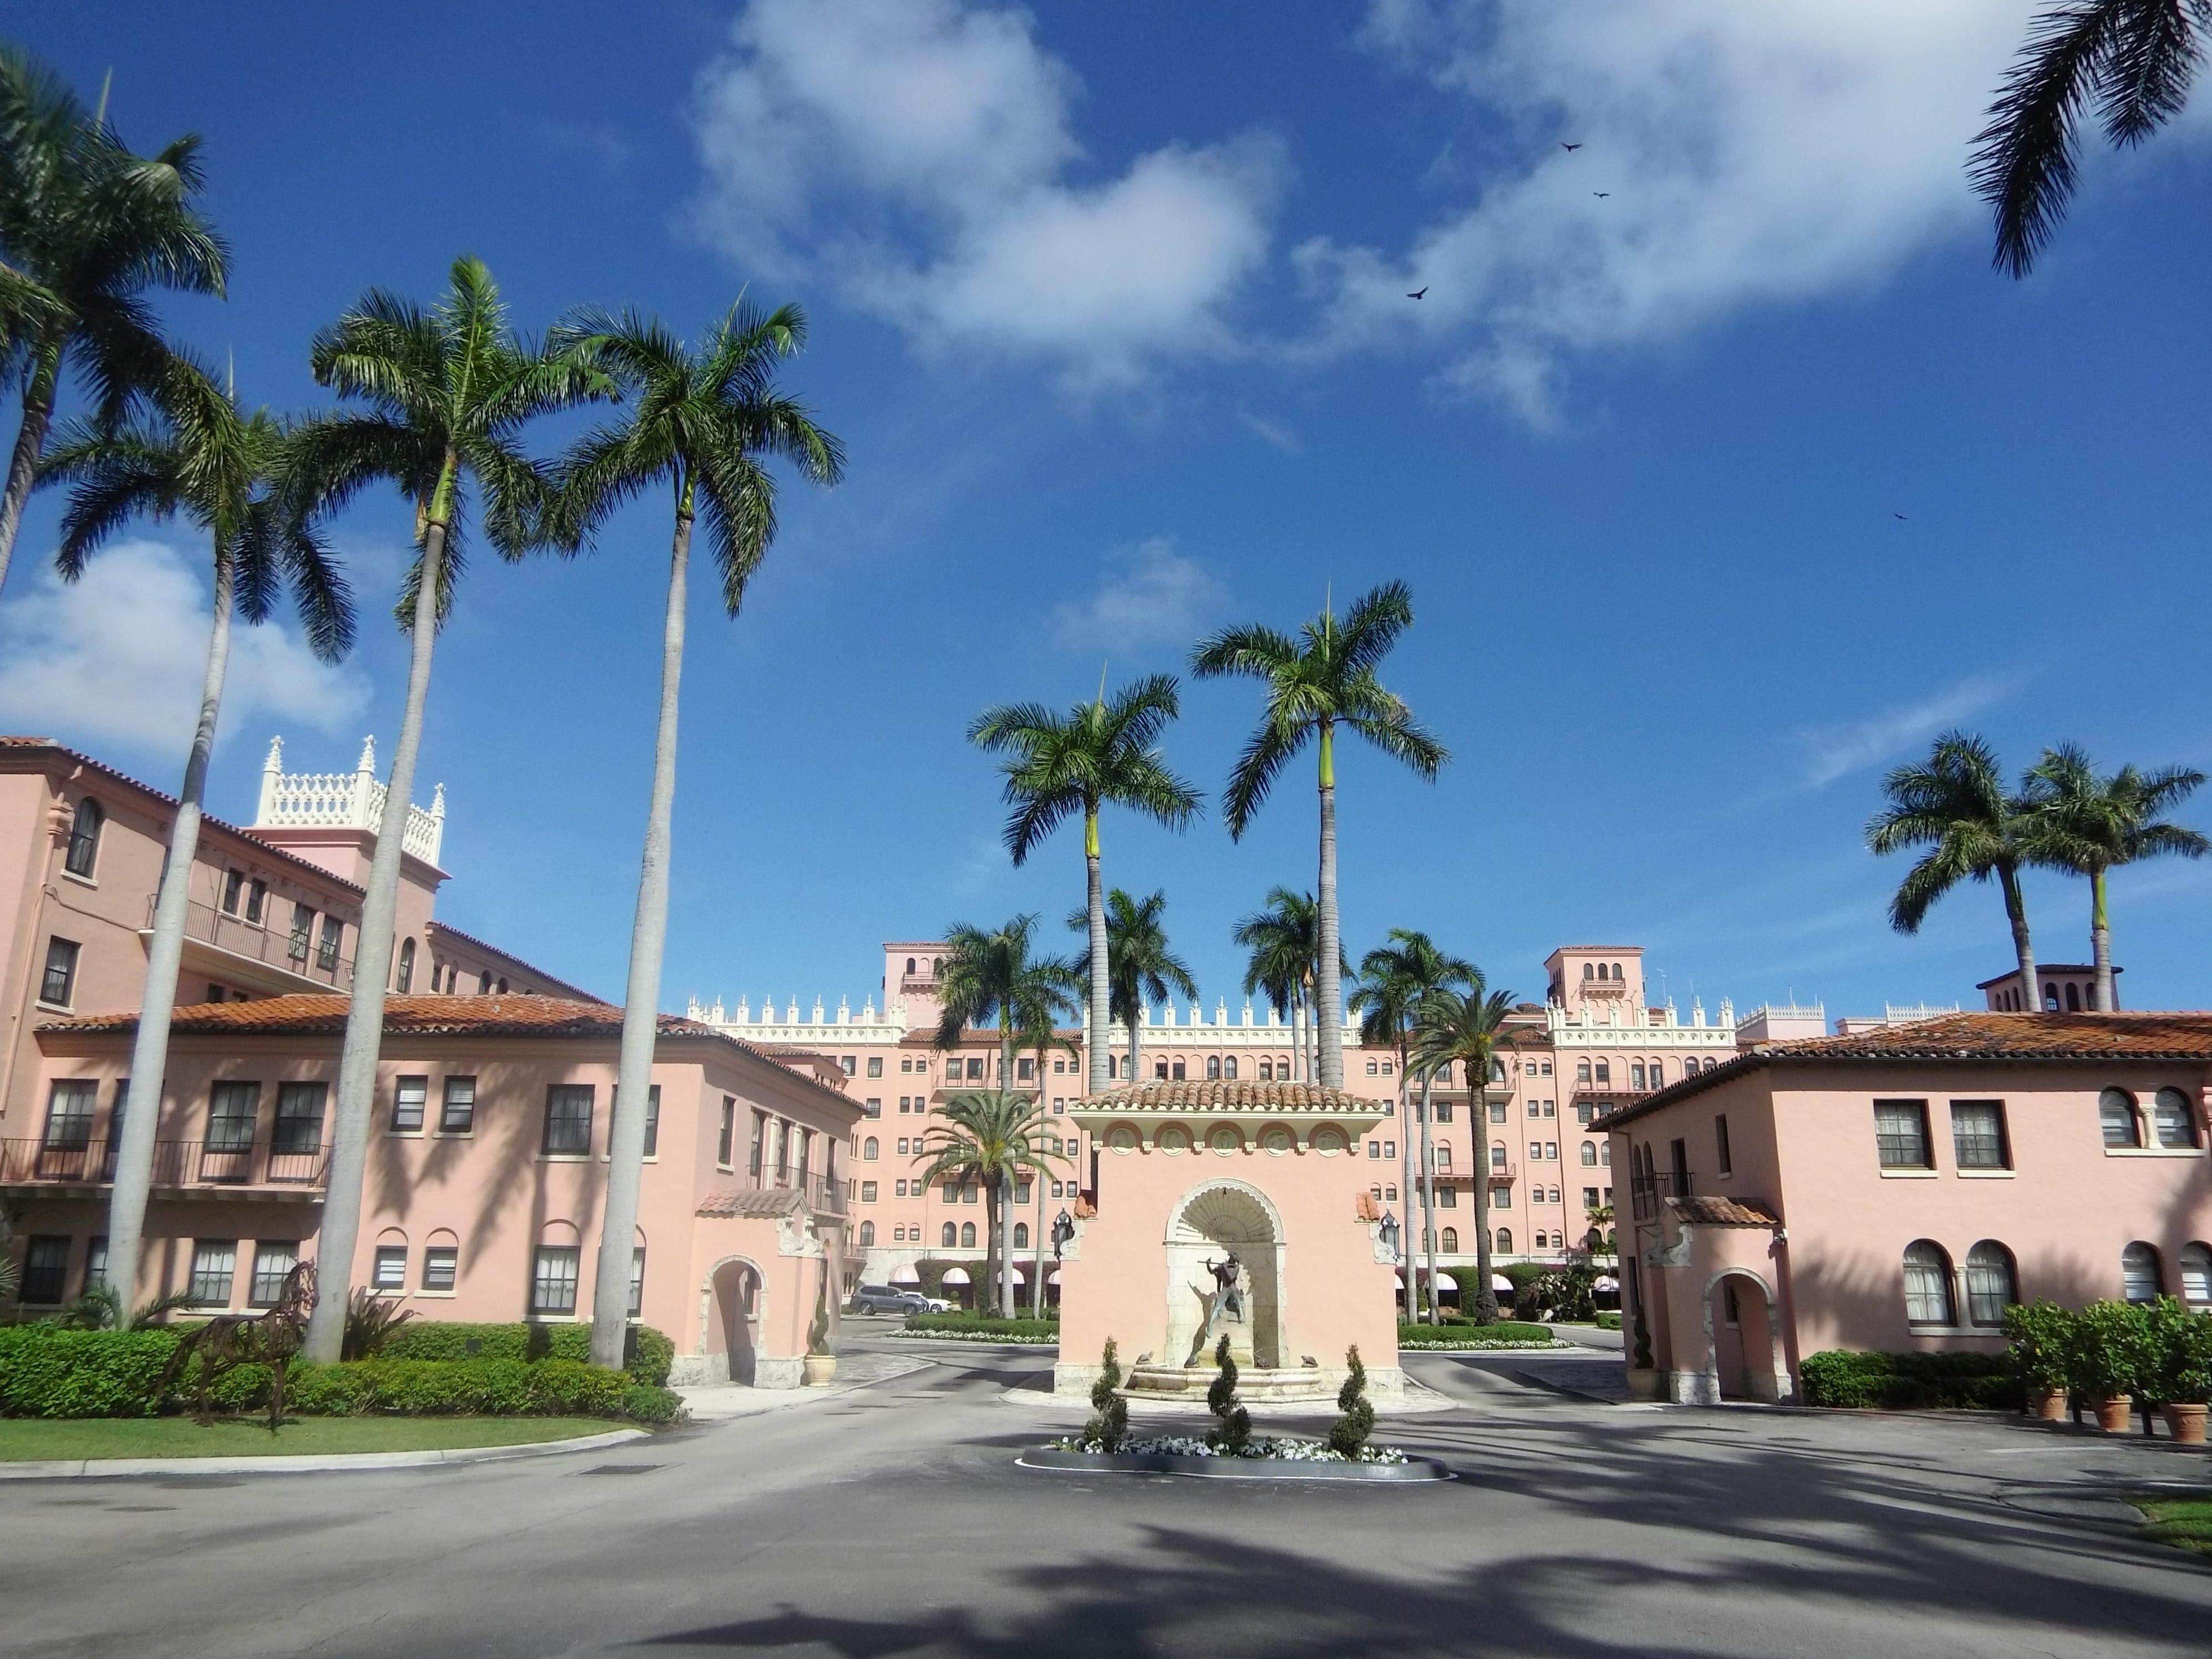 Boca Raton Resort & Club in Boca Raton, Florida.